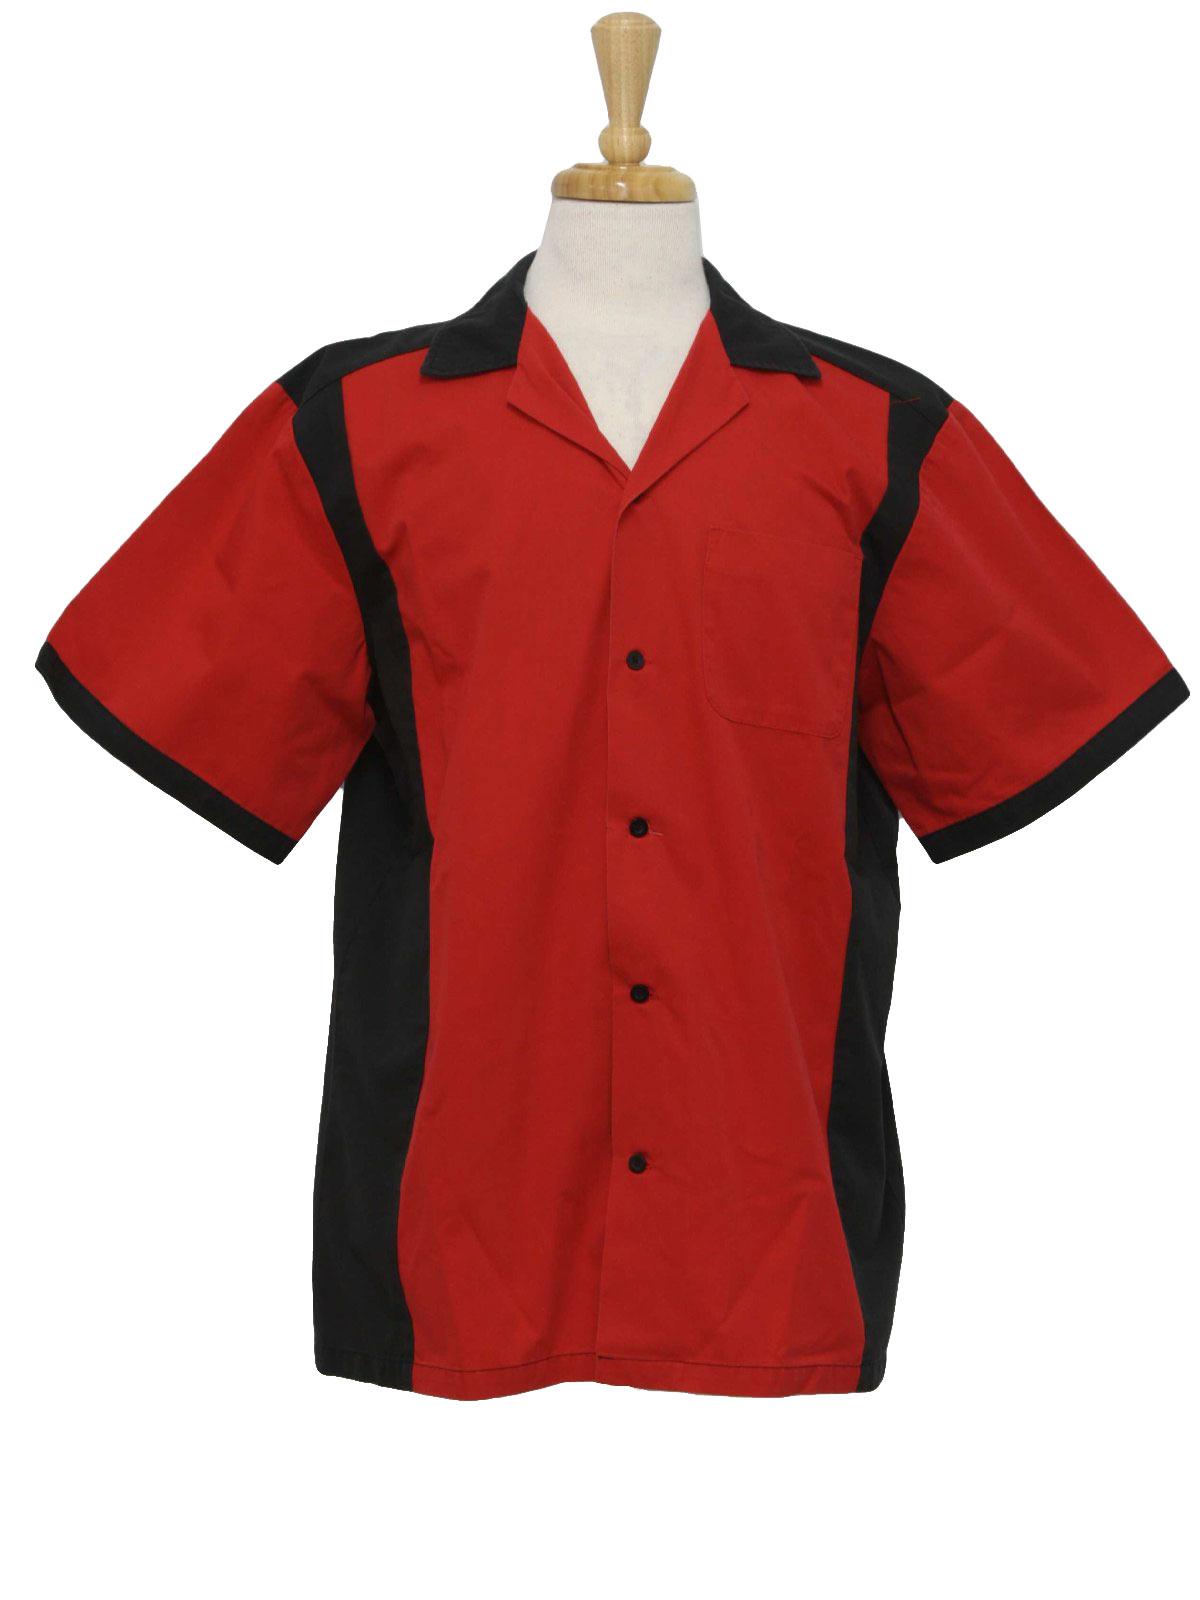 Mens Vintage Bowling Shirts